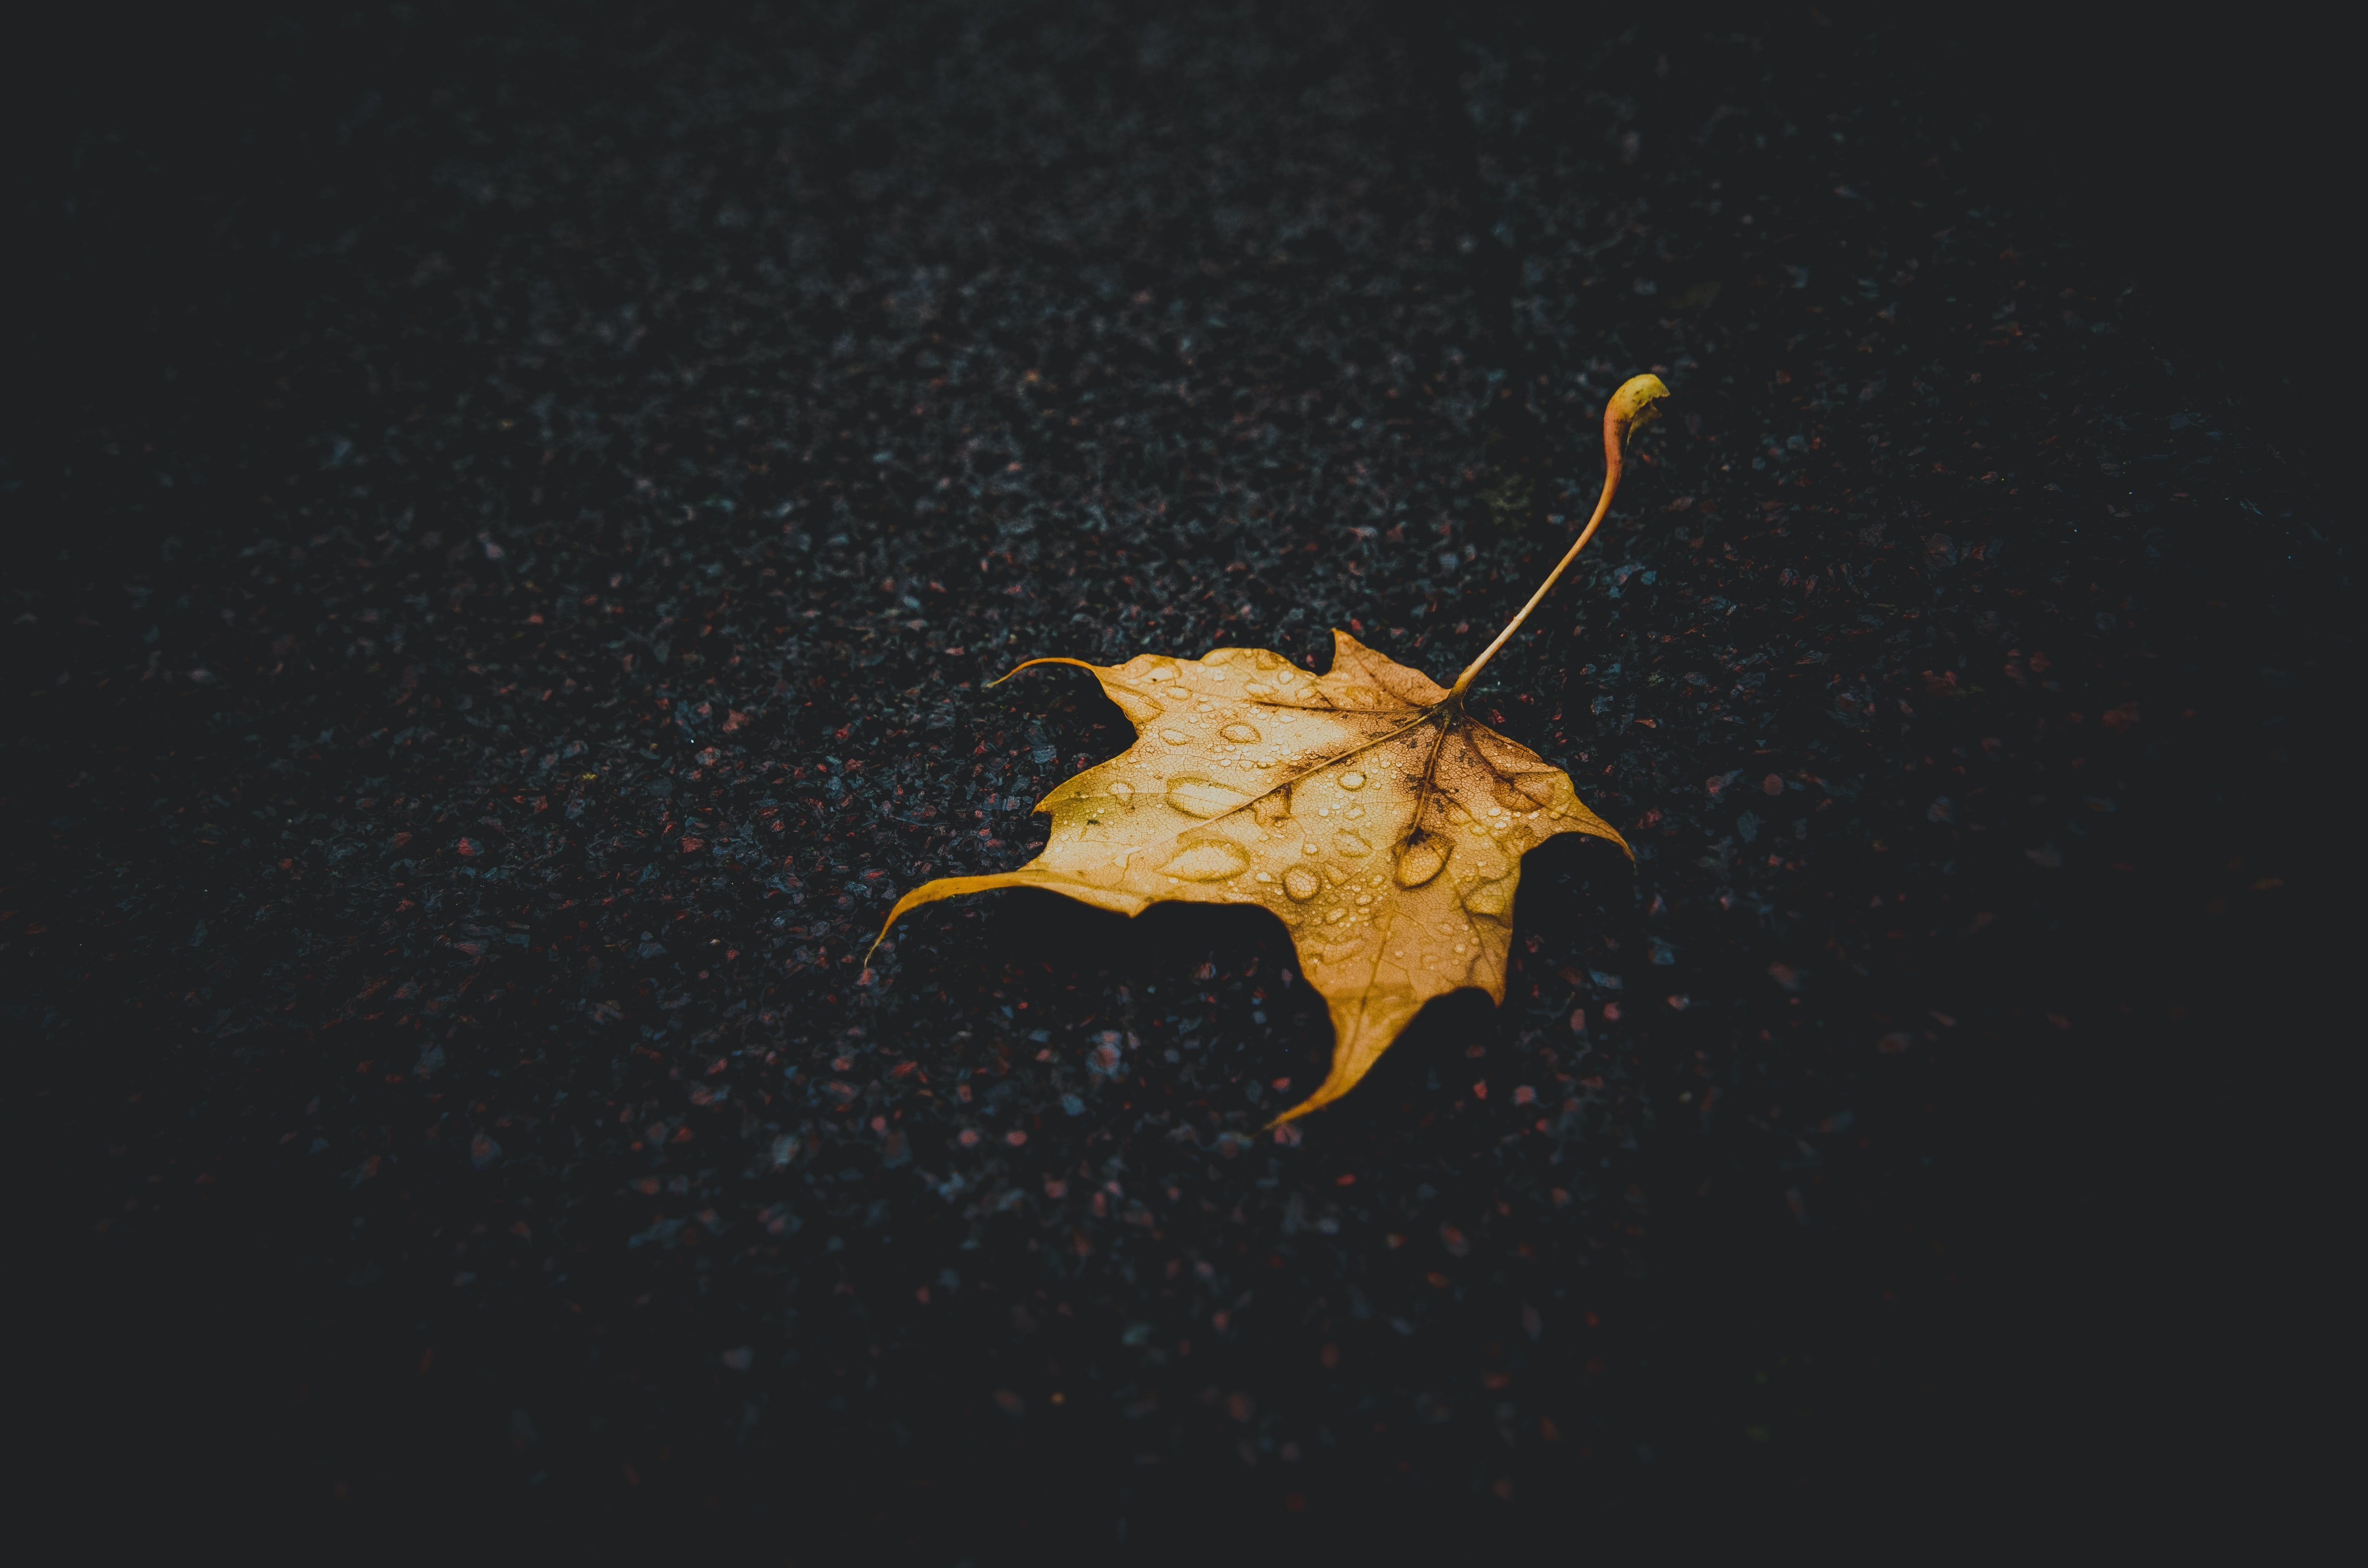 macro shot photography of brown maple leaf during rainy season